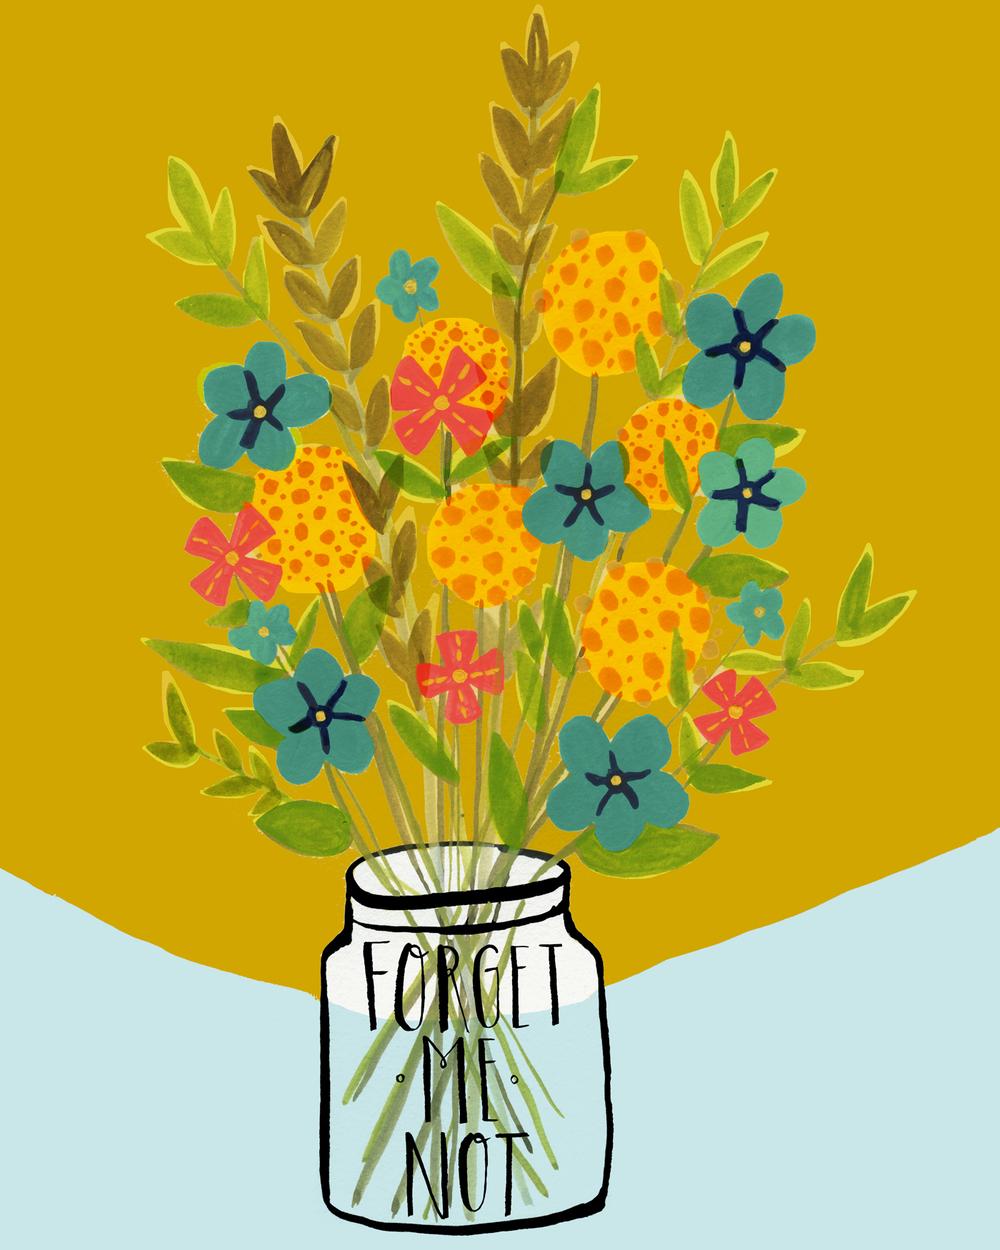 Forget Me Not Bouquet, gouache on paper, Sarah Golden